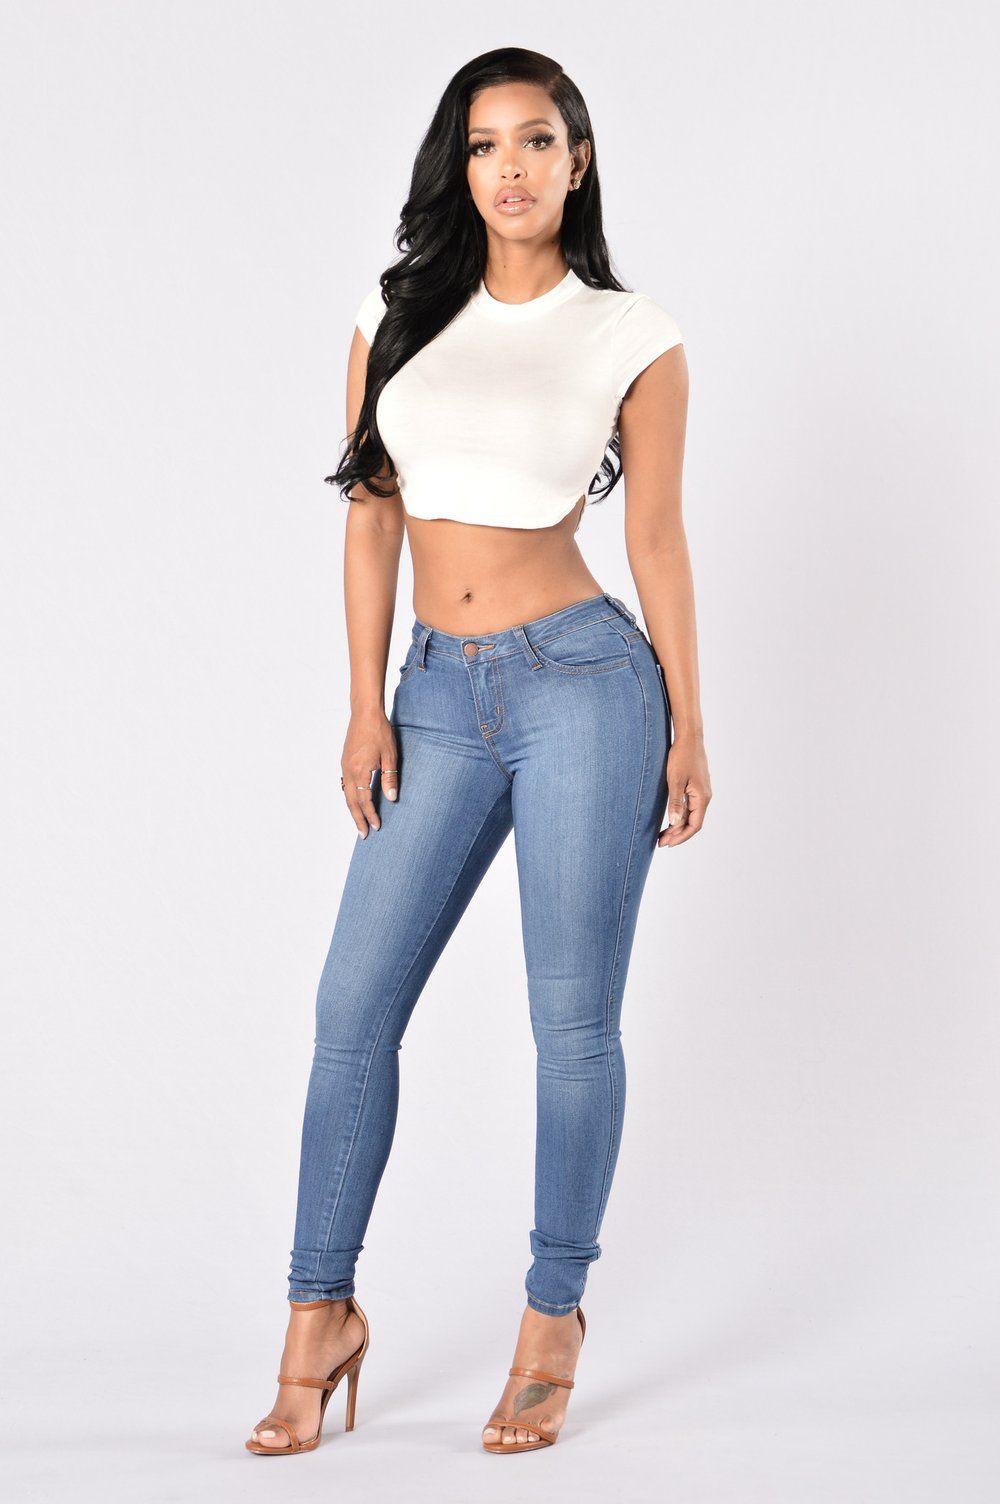 Classic Mid Rise Skinny Jeans Medium Blue Wash Mid Rise Skinny Jeans Skinny Jeans Fashion